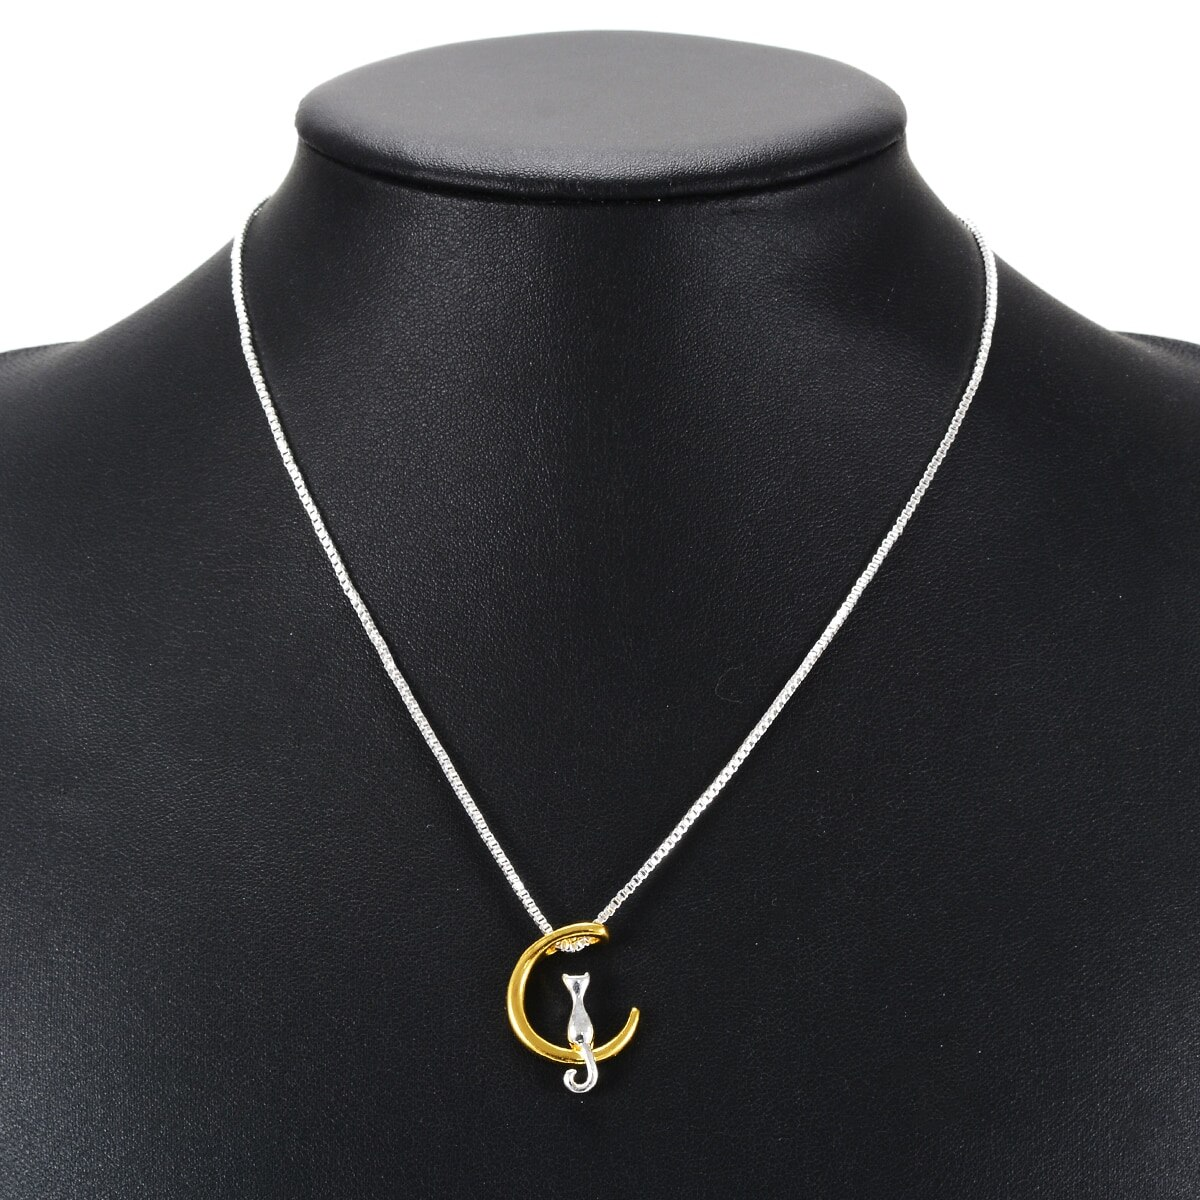 Ожерелье с подвеской Кот на Луне длинная цепочка шею бижутерия|long chain|cat fashionpendant cat